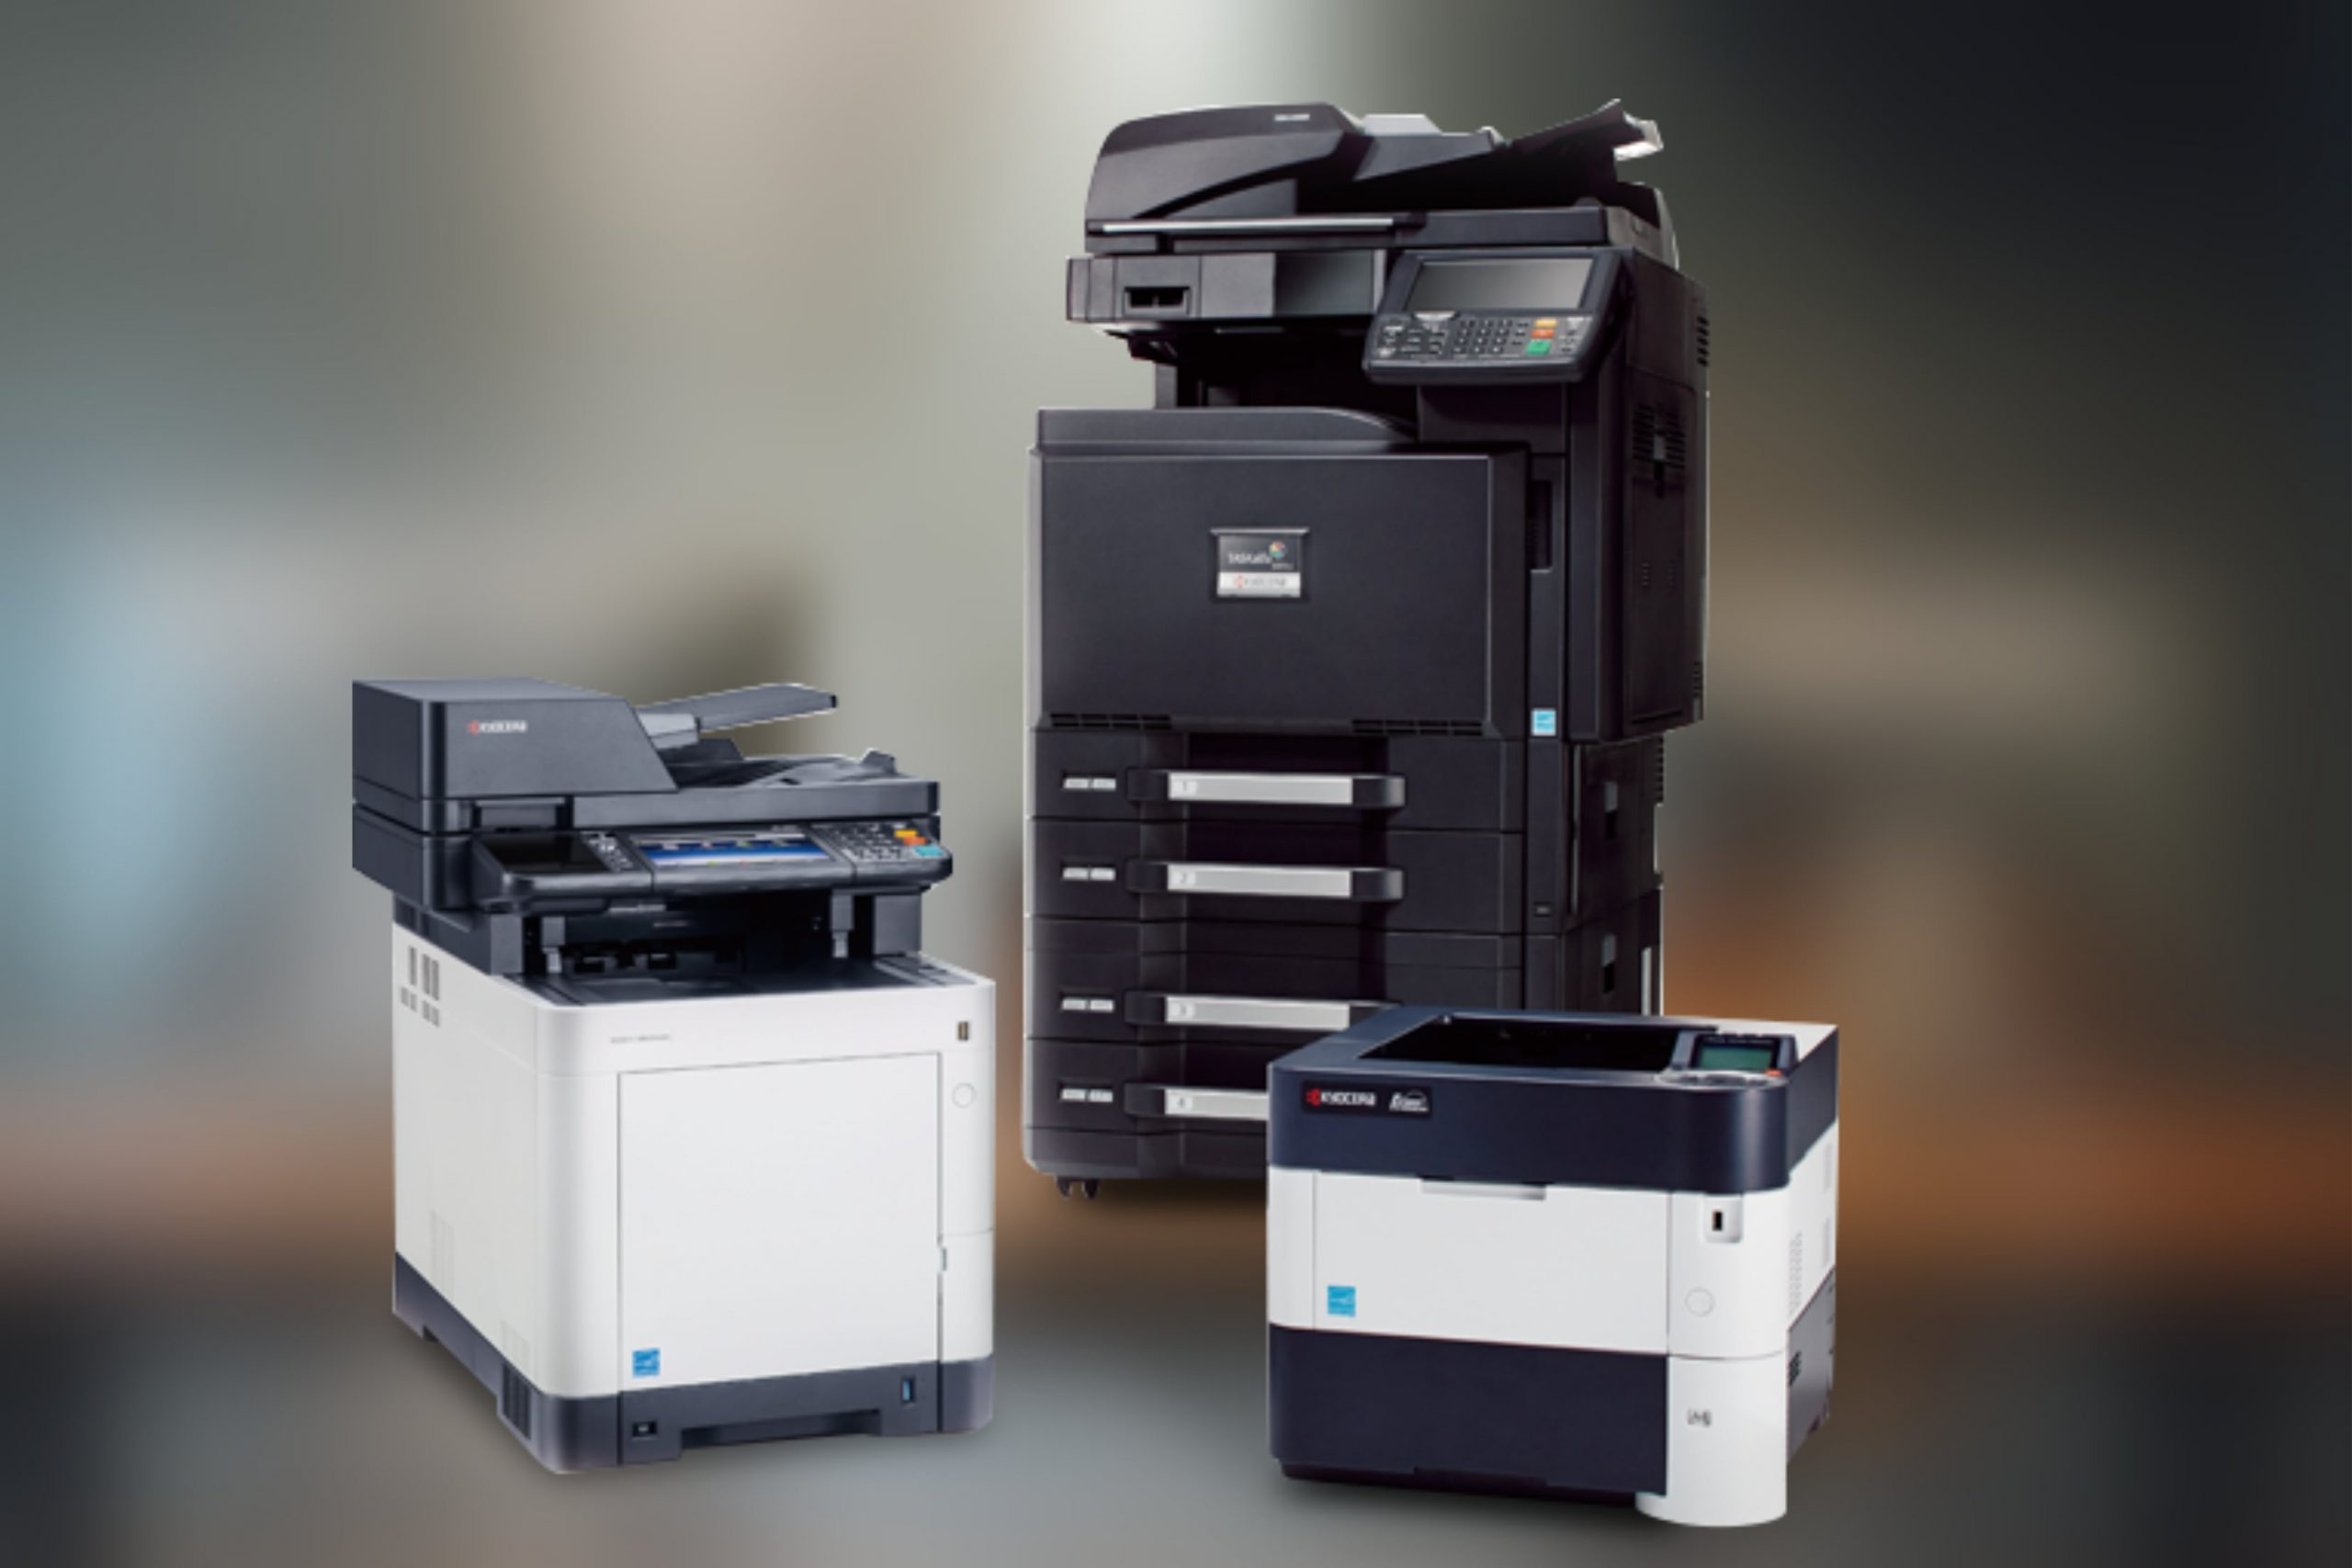 Distinguishing Between A Multifunction Printer And Multitasking Print Device